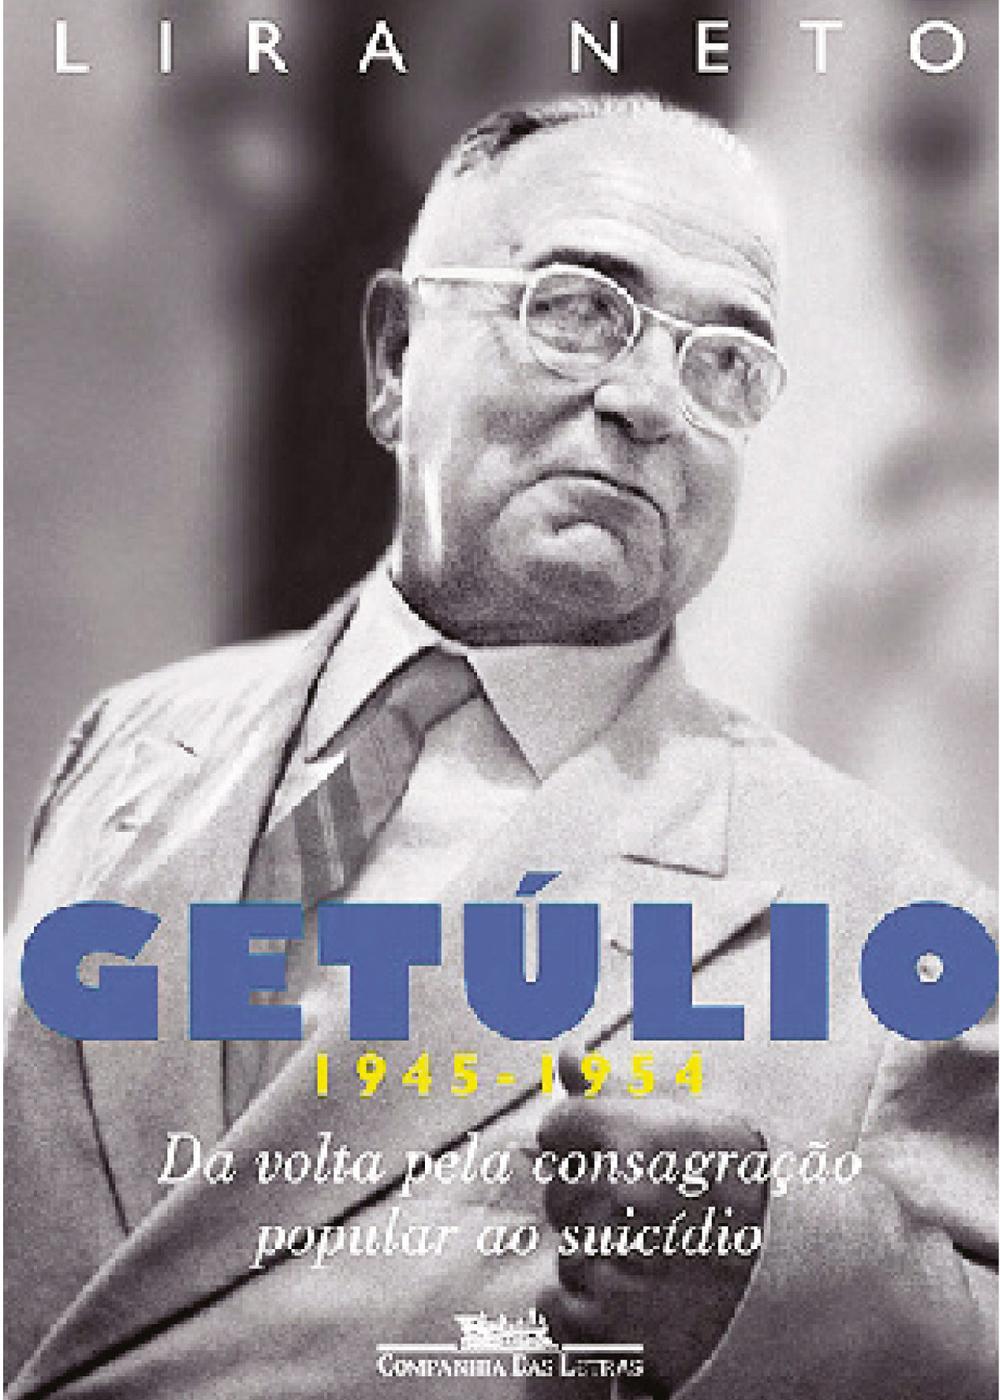 Neto, Lira - Getúlio (1945-1954).jpg